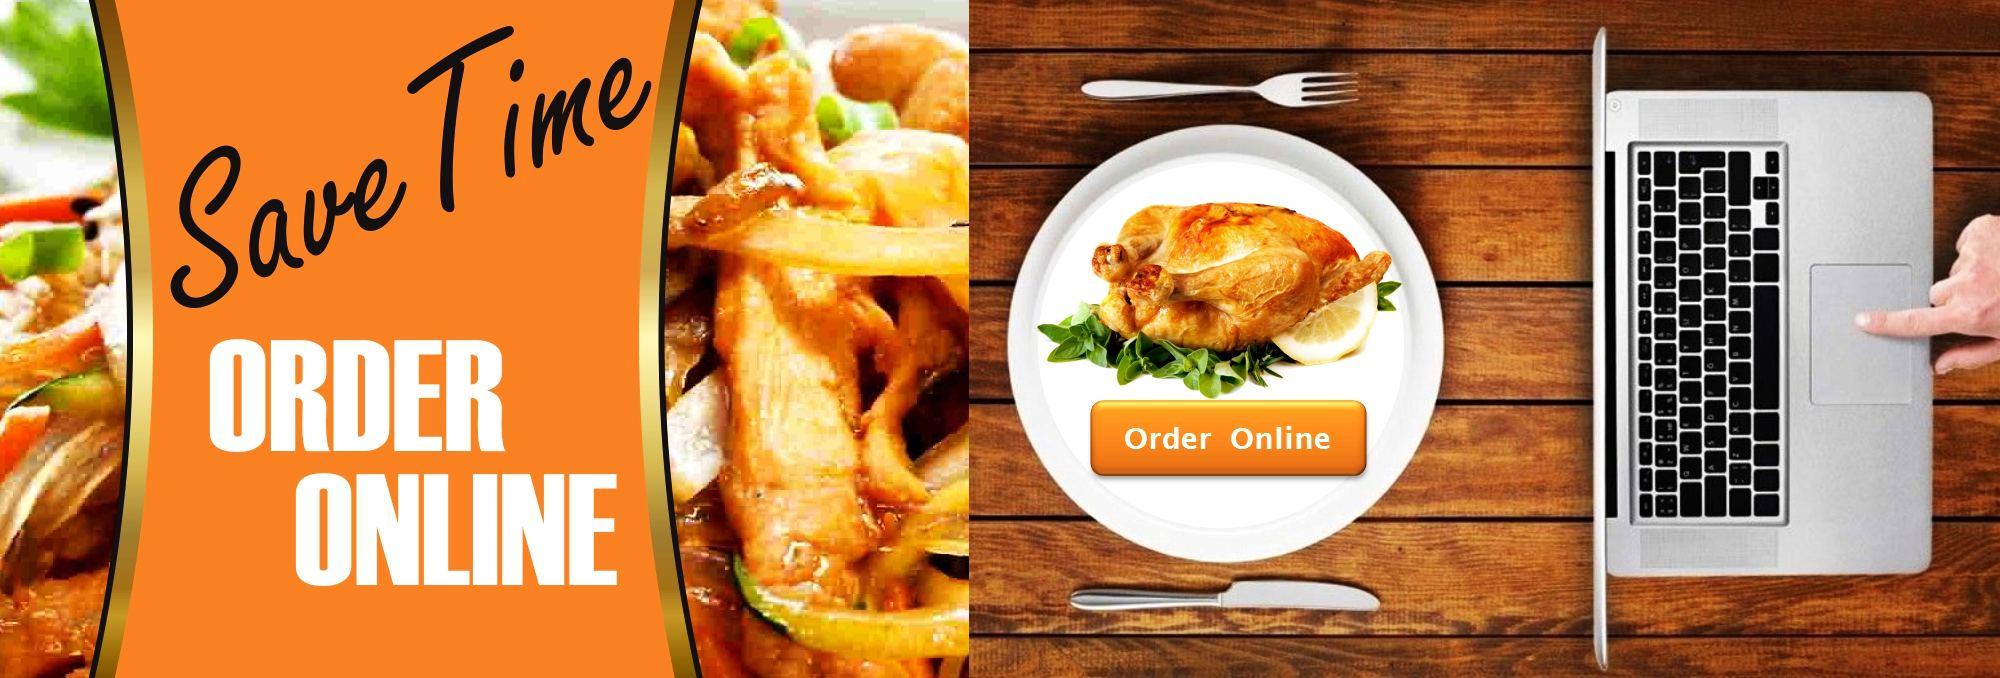 Save Time - Order Online - Spice Meat Shop